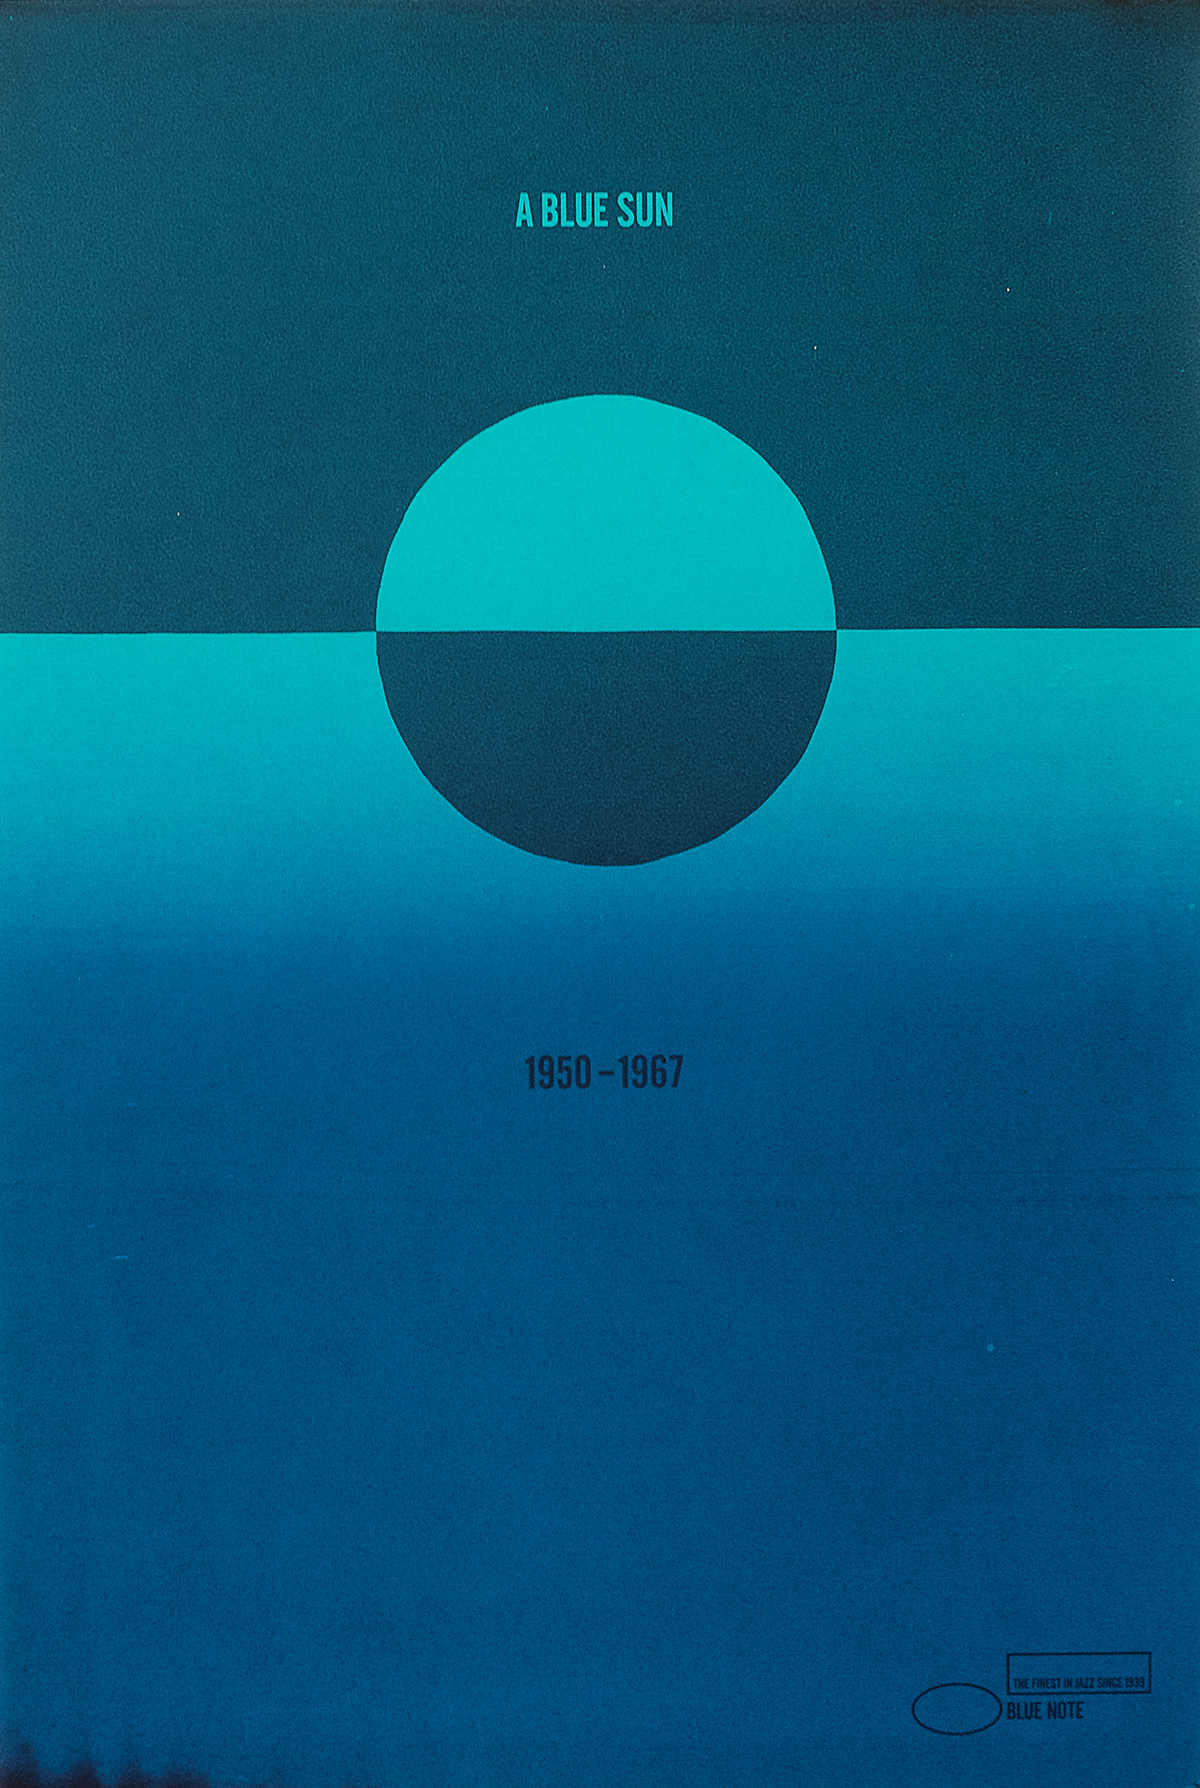 carin-nilsson_blue-note-a-blue-sun_f14.png